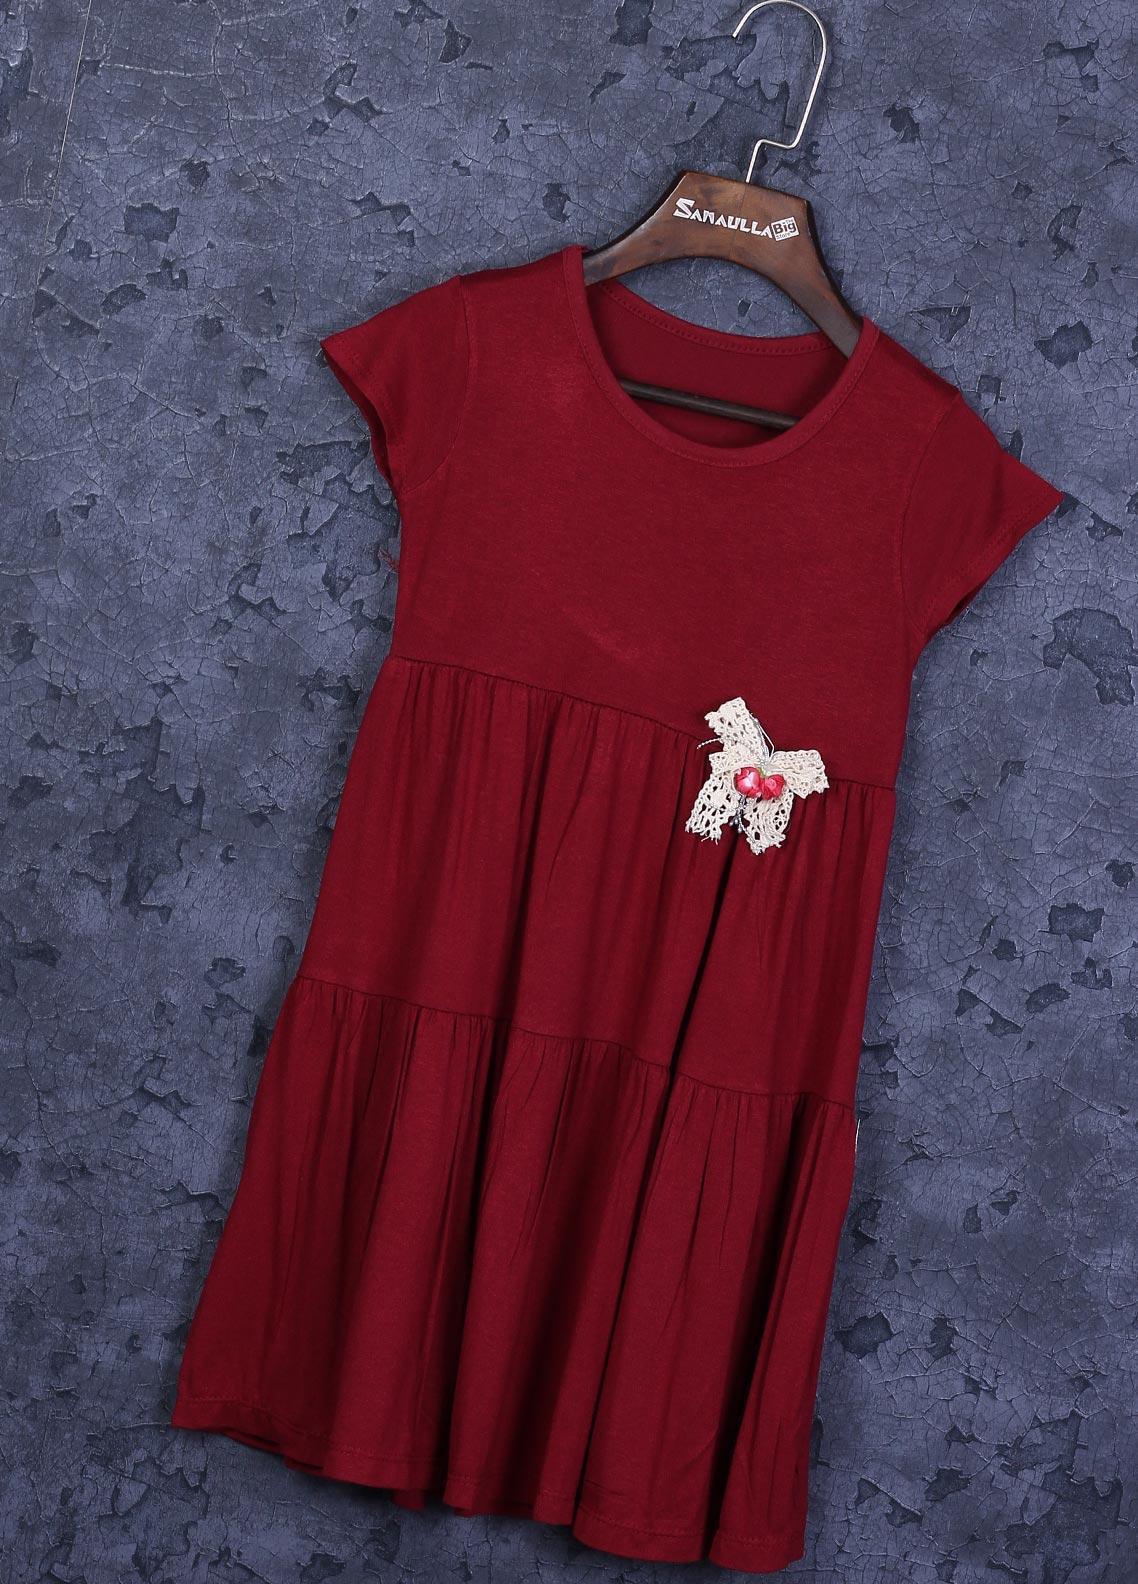 Sanaulla Exclusive Range Cotton Fancy Frocks for Girls -  22772-1 Maroon